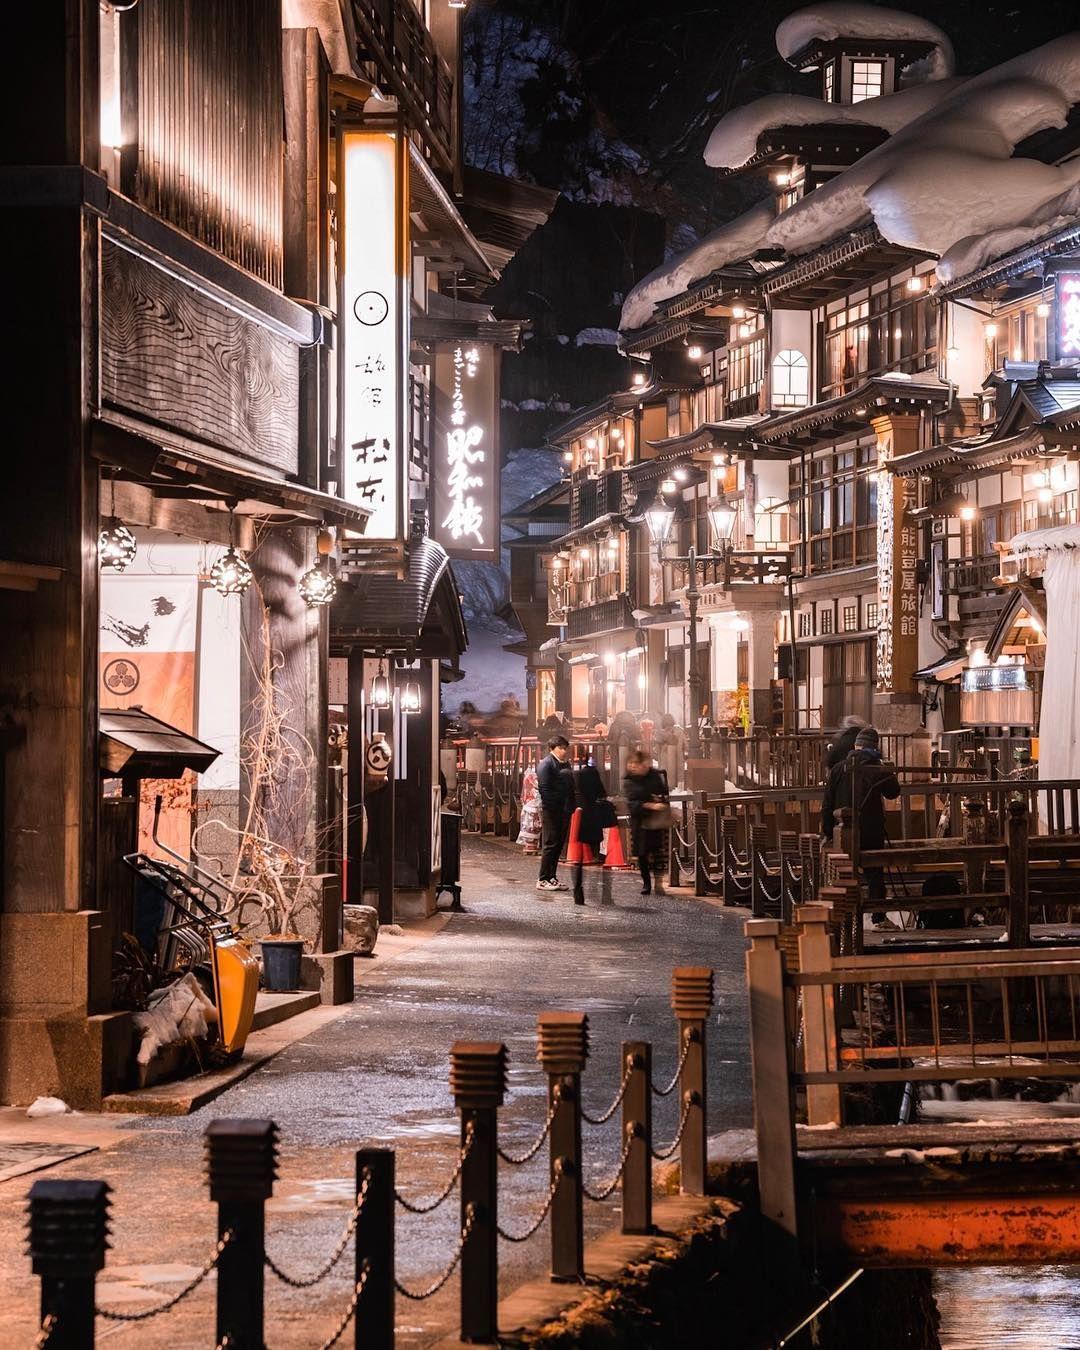 Winter Night Ginzan Onsen Yamagata Prefecture Japan 冬の夜 山形県銀山温泉 By Kazuma 24 Kazumma527 On Instagram 日本旅行 銀山温泉 温泉